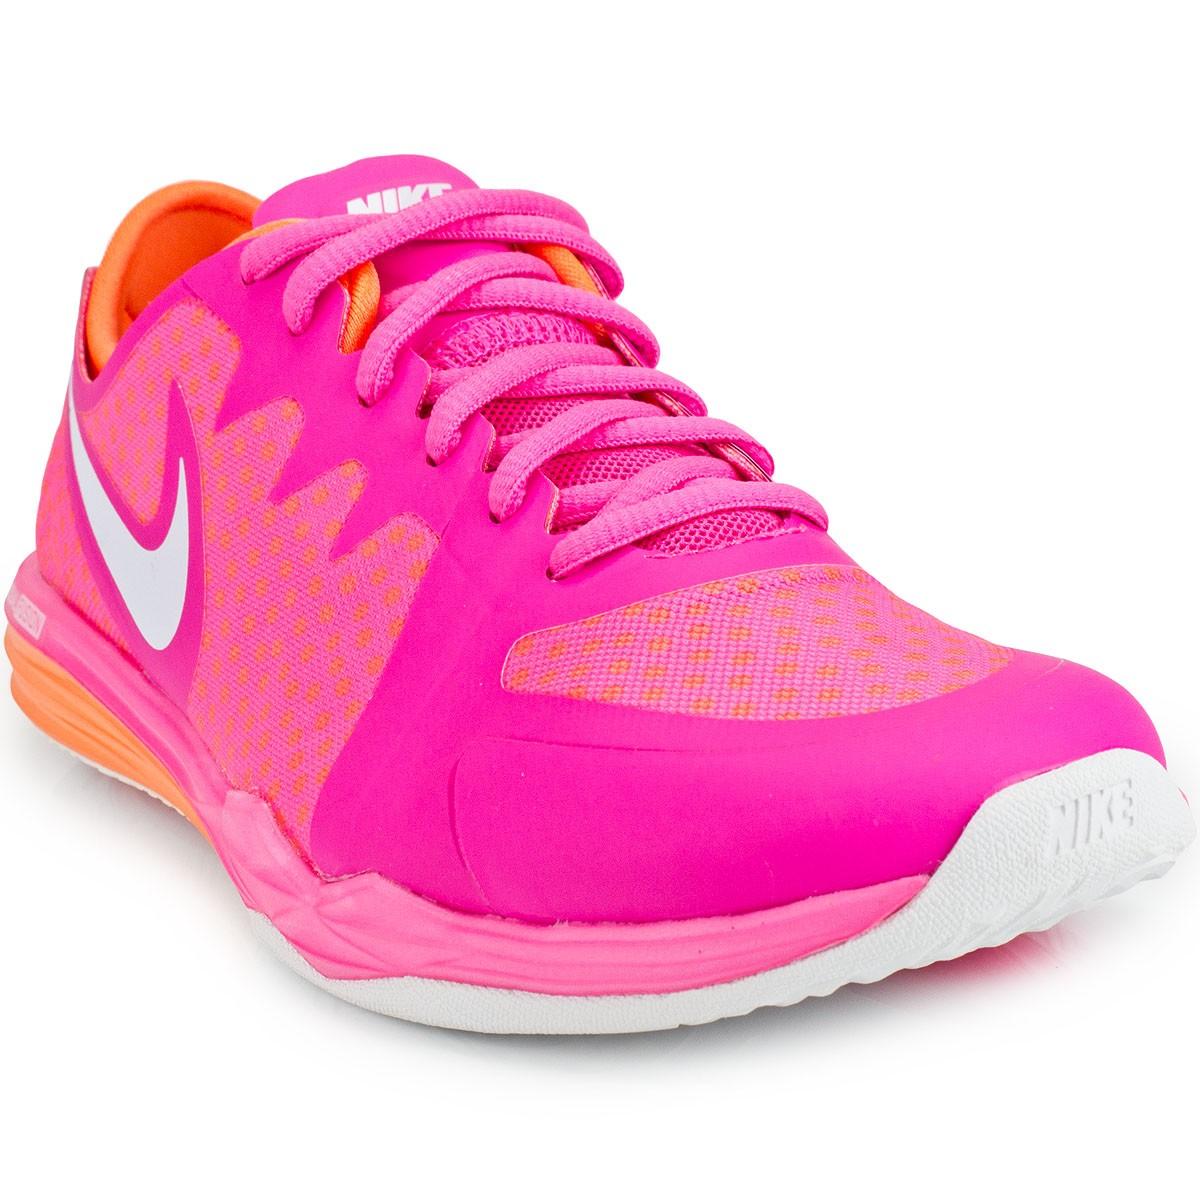 62f50bc55 Tênis Nike Dual Fusion Tr 3 Print W | Fitness | MaxTennis